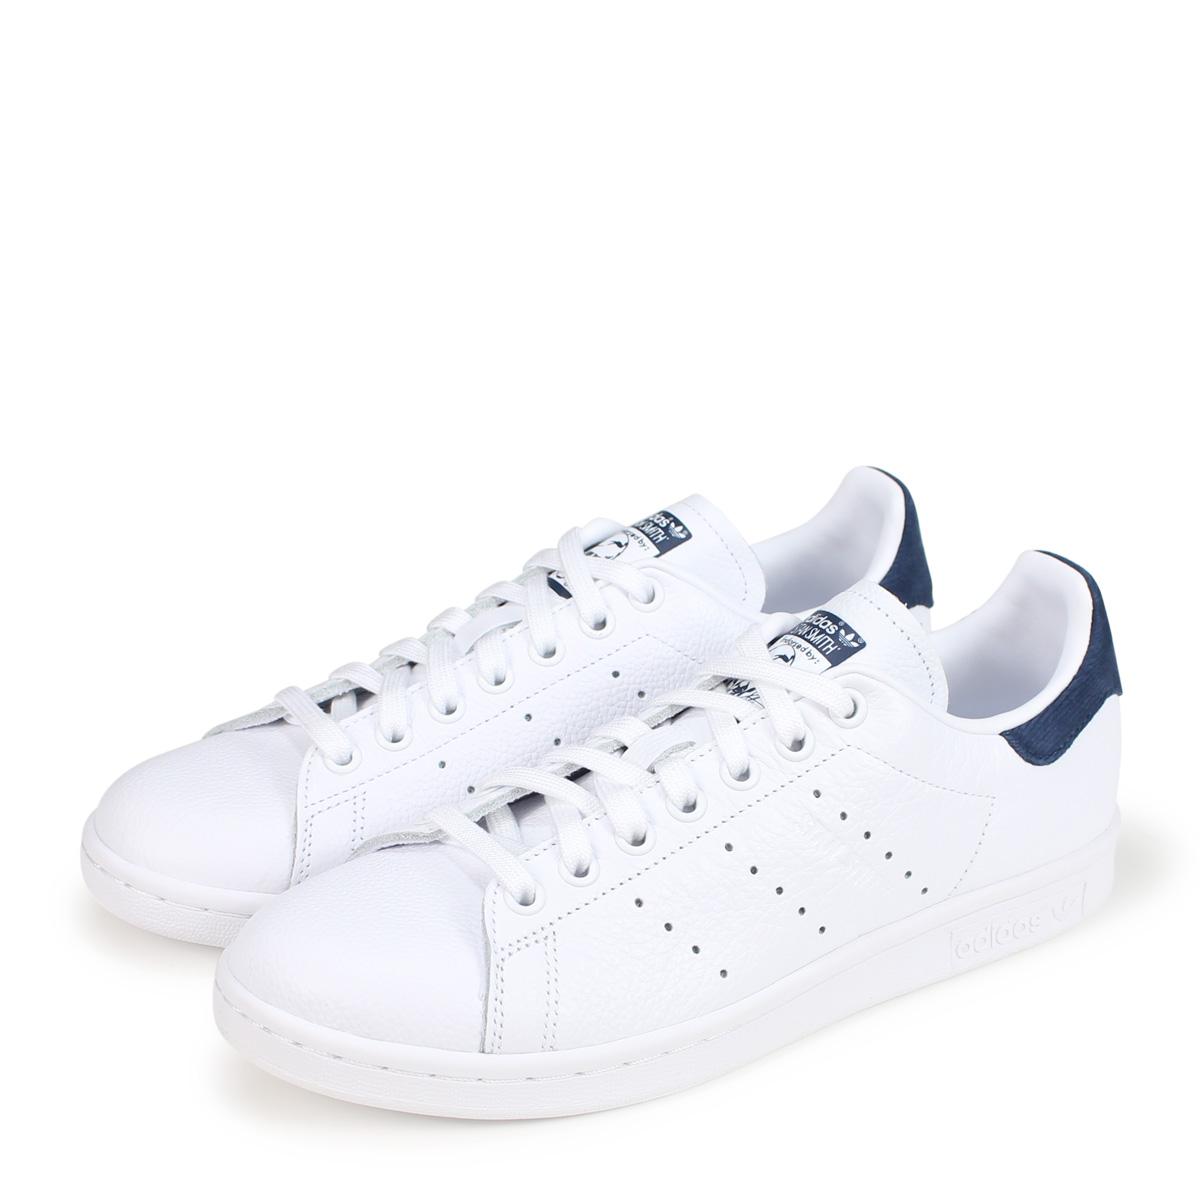 Adidas Stan Smith W B41626 Age Adulte, Couleur